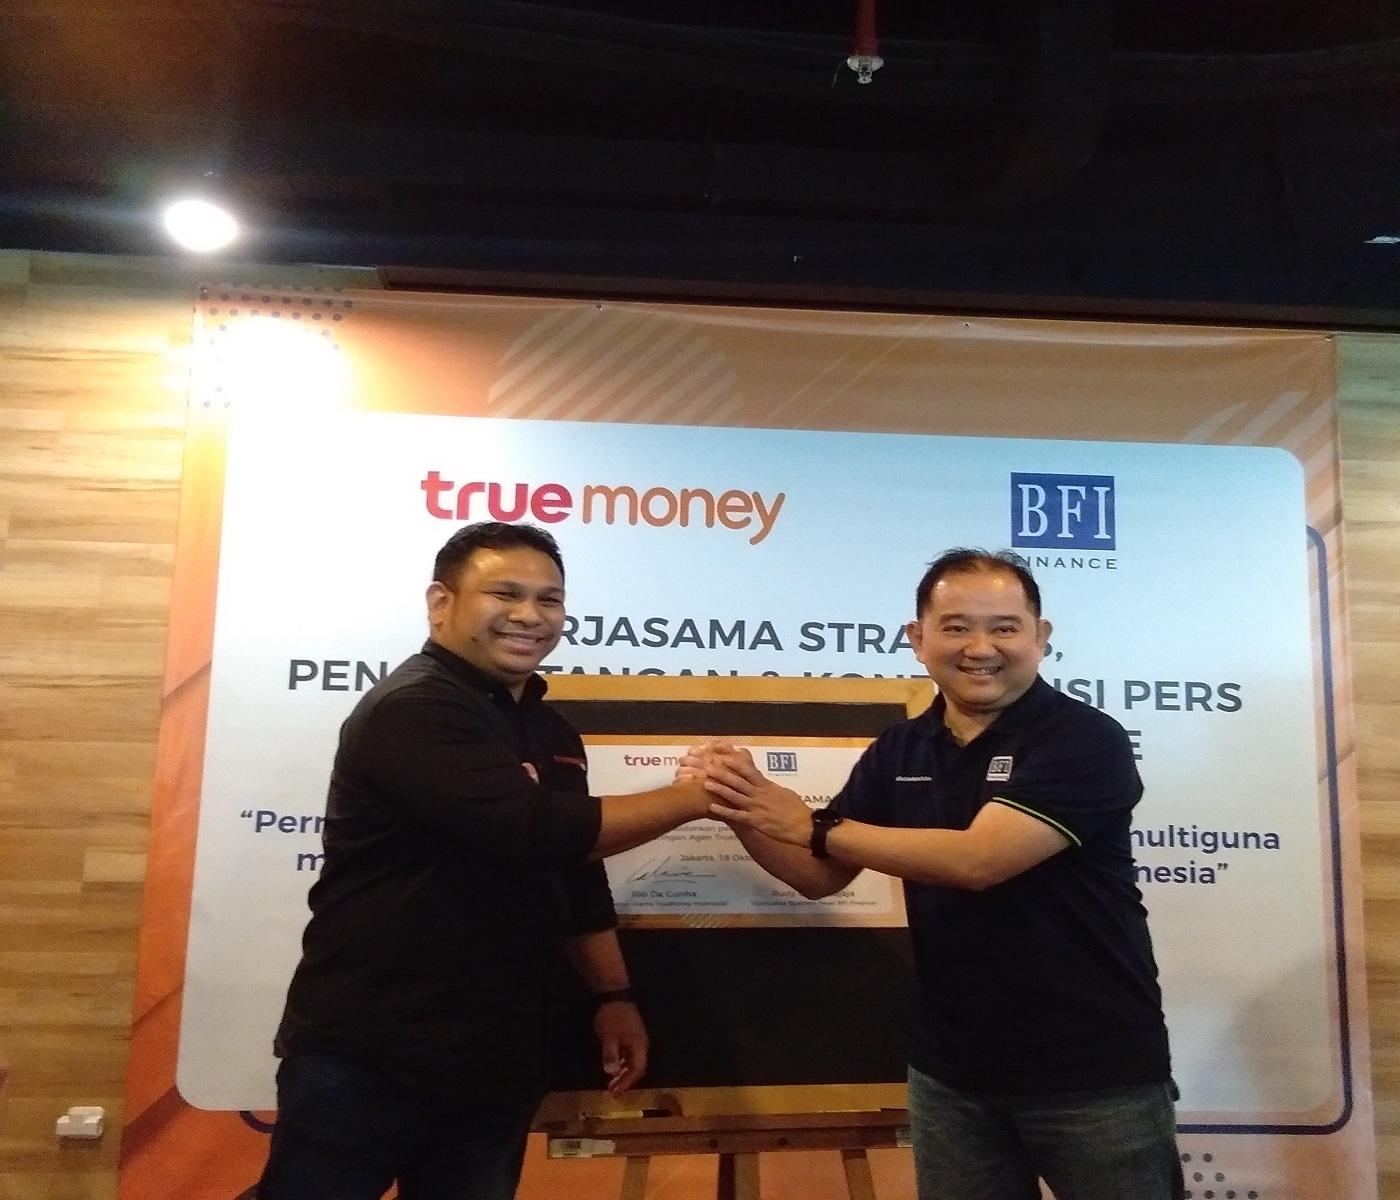 Kemitraan TrueMoney dan BFI Finance